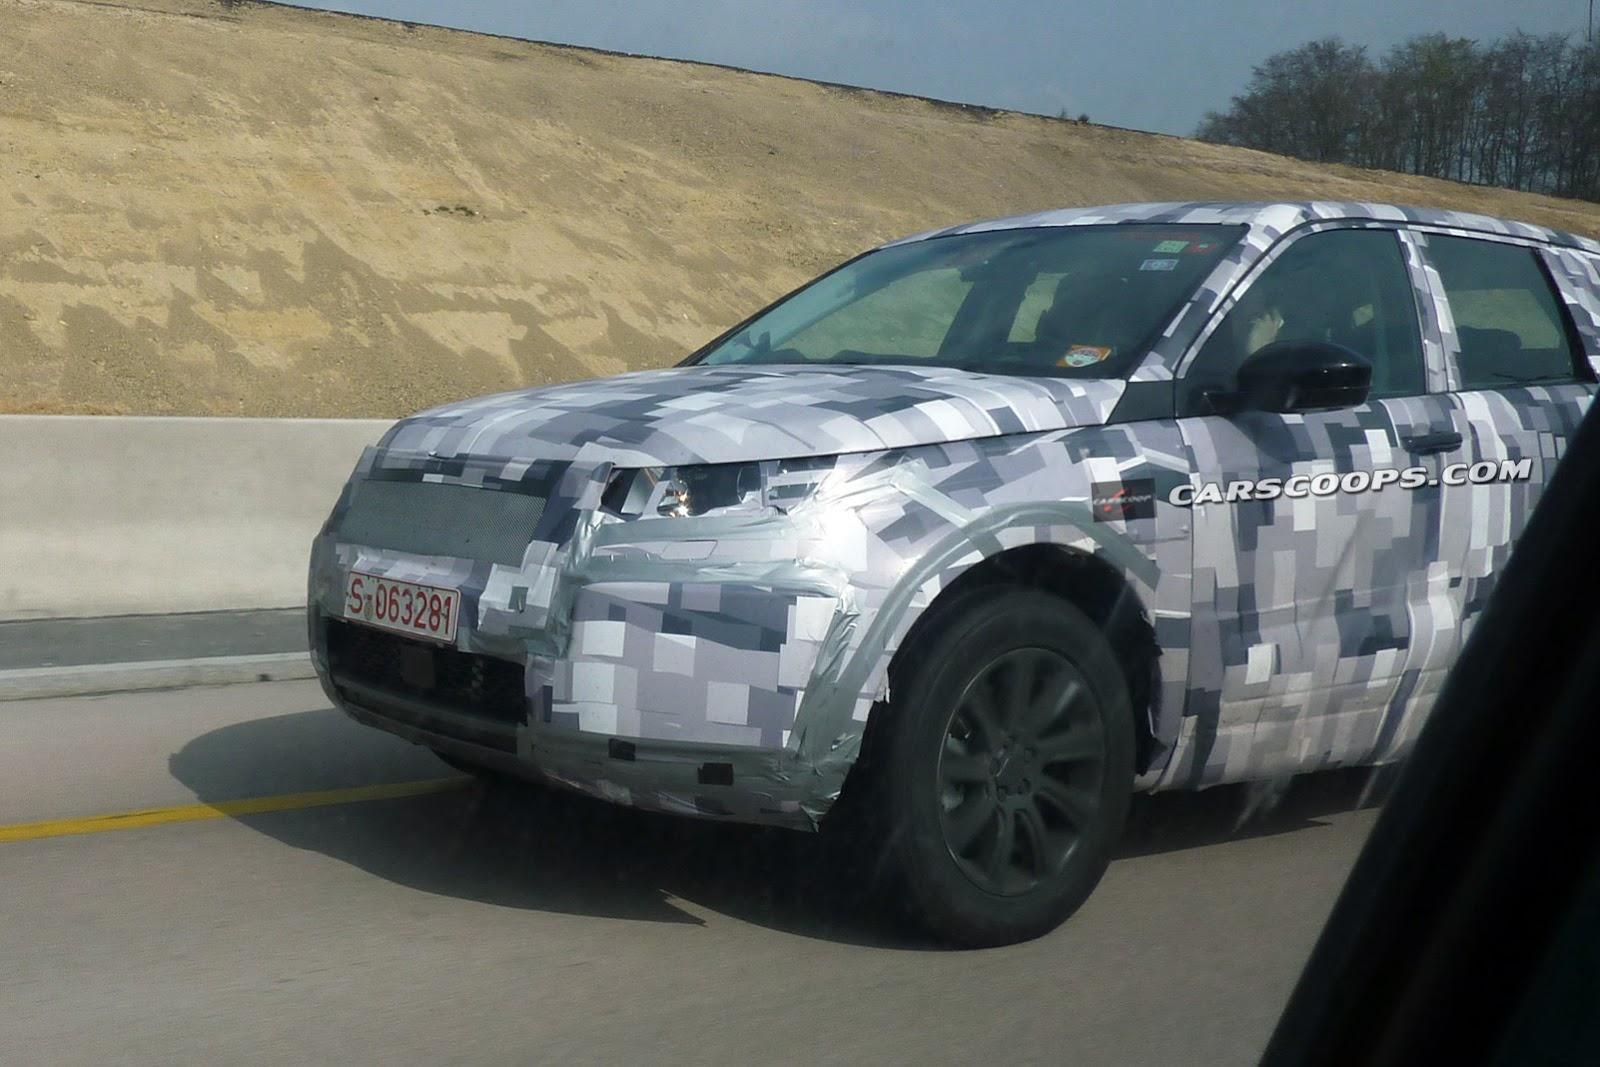 2014 - [Land Rover] Discovery Sport [L550] - Page 3 U-Spy-LR-6%25255B4%25255D